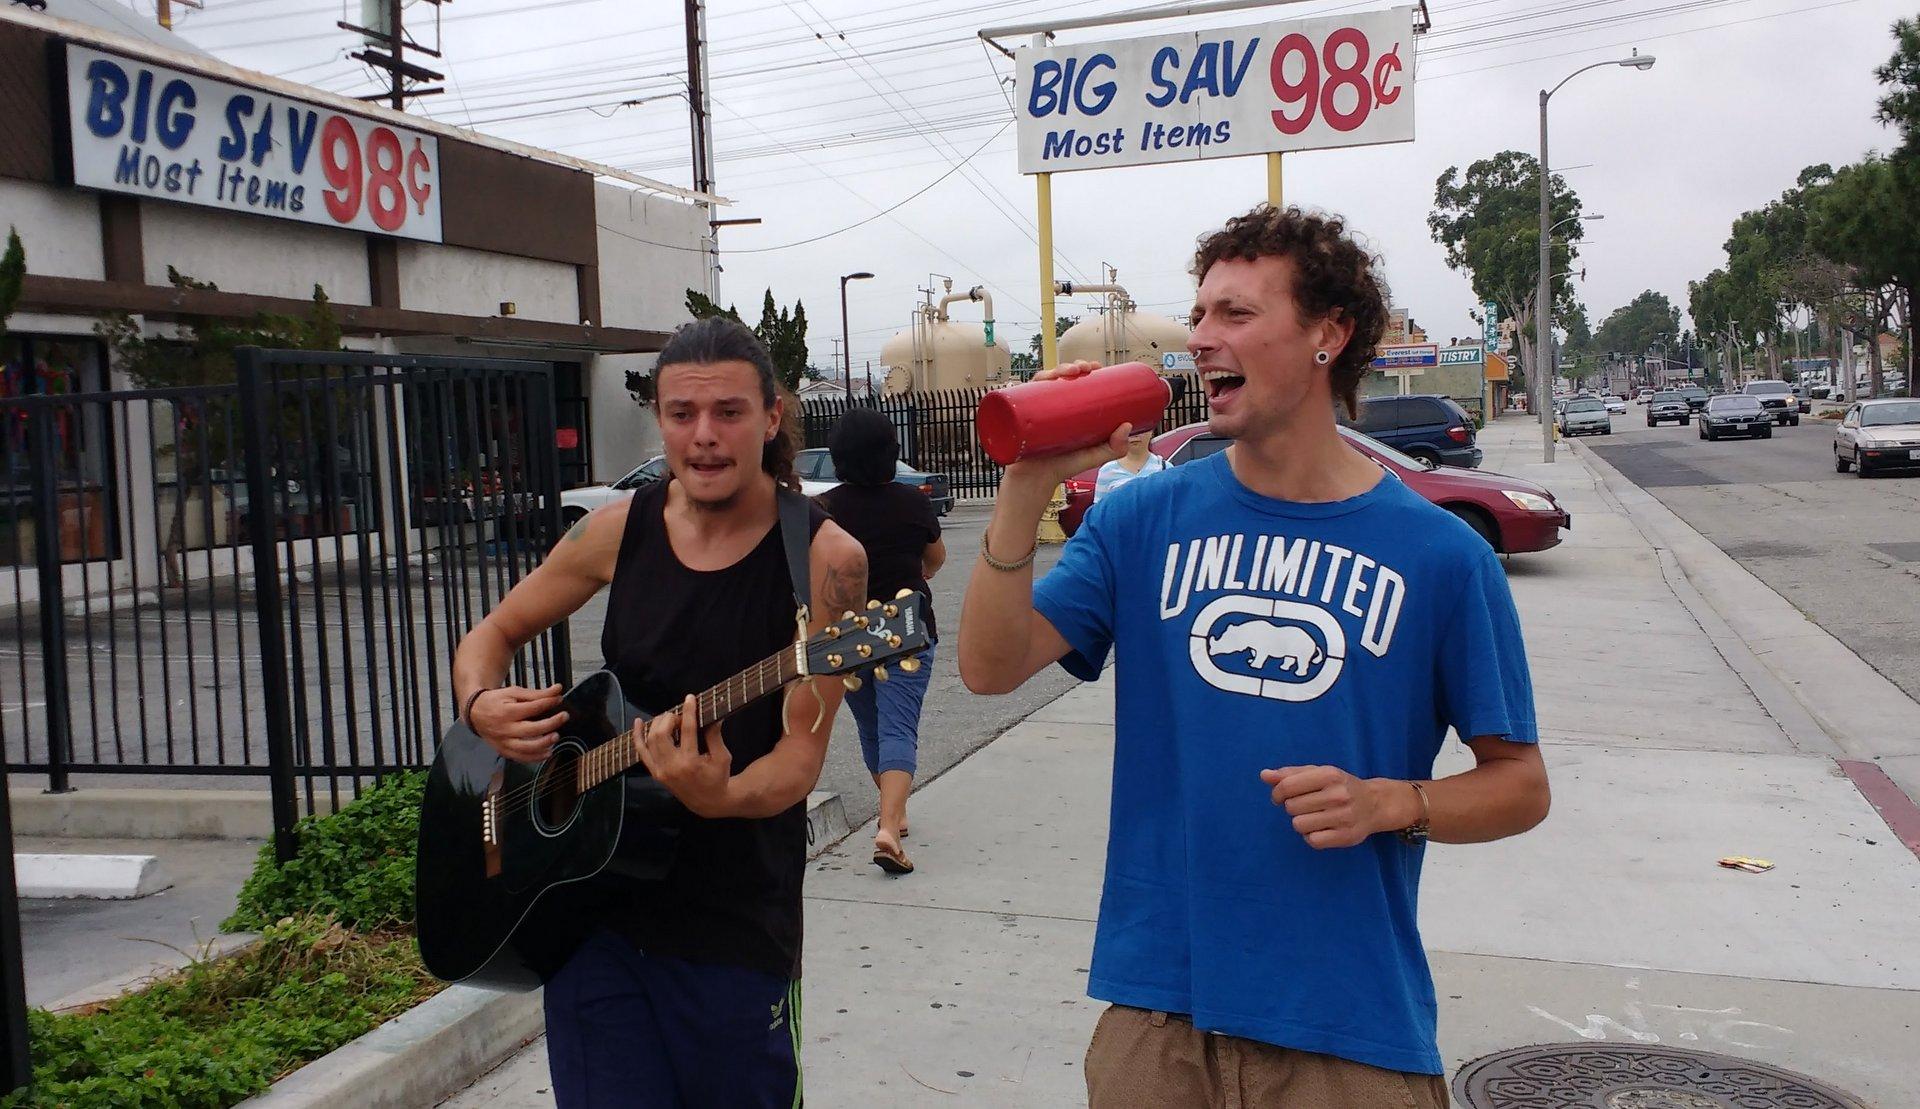 Fabio & Antonio walking down the street singing and playing guitar